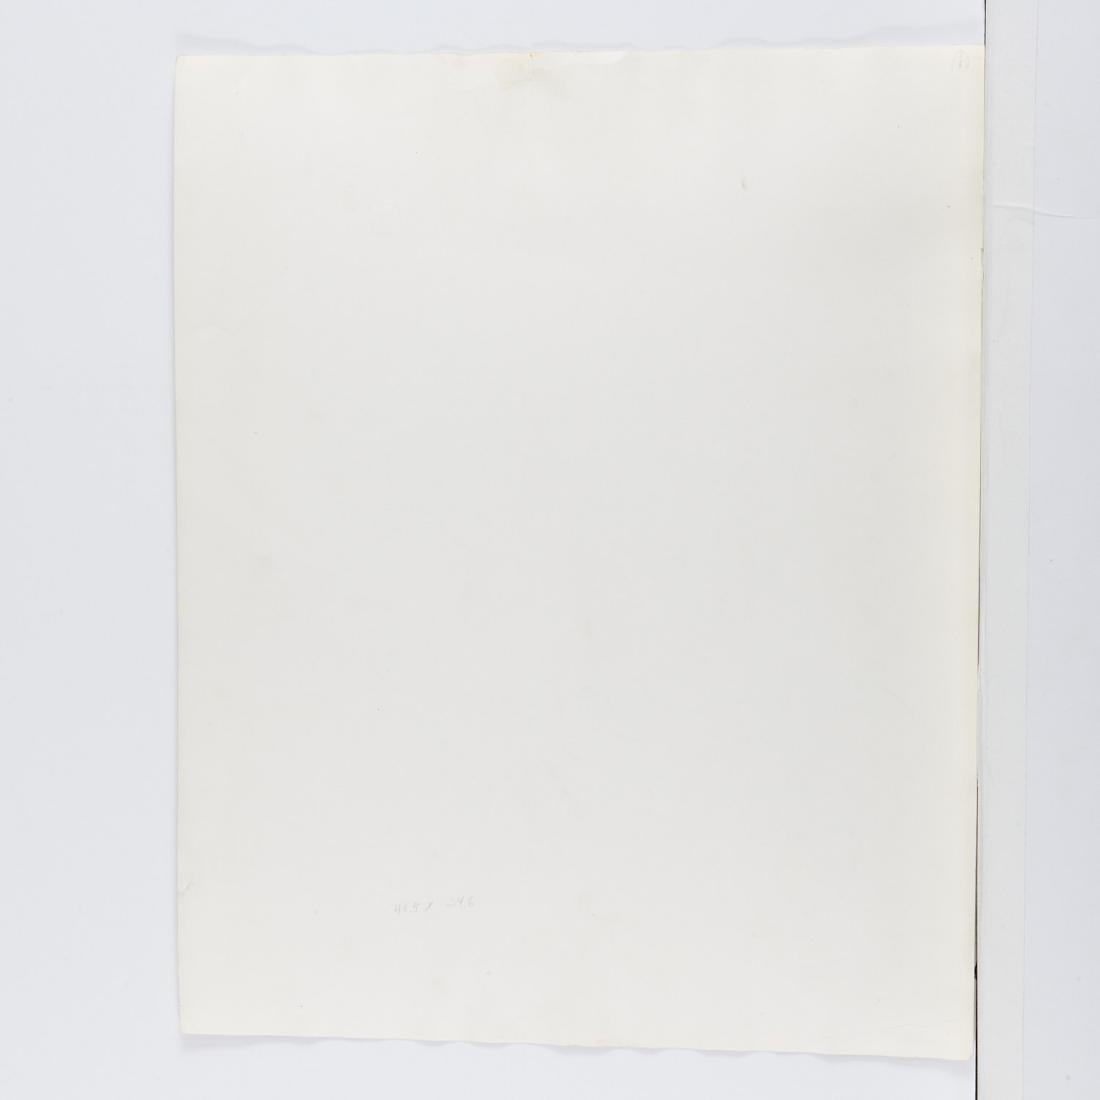 Margaret Bourke-White, large format photograph - 7